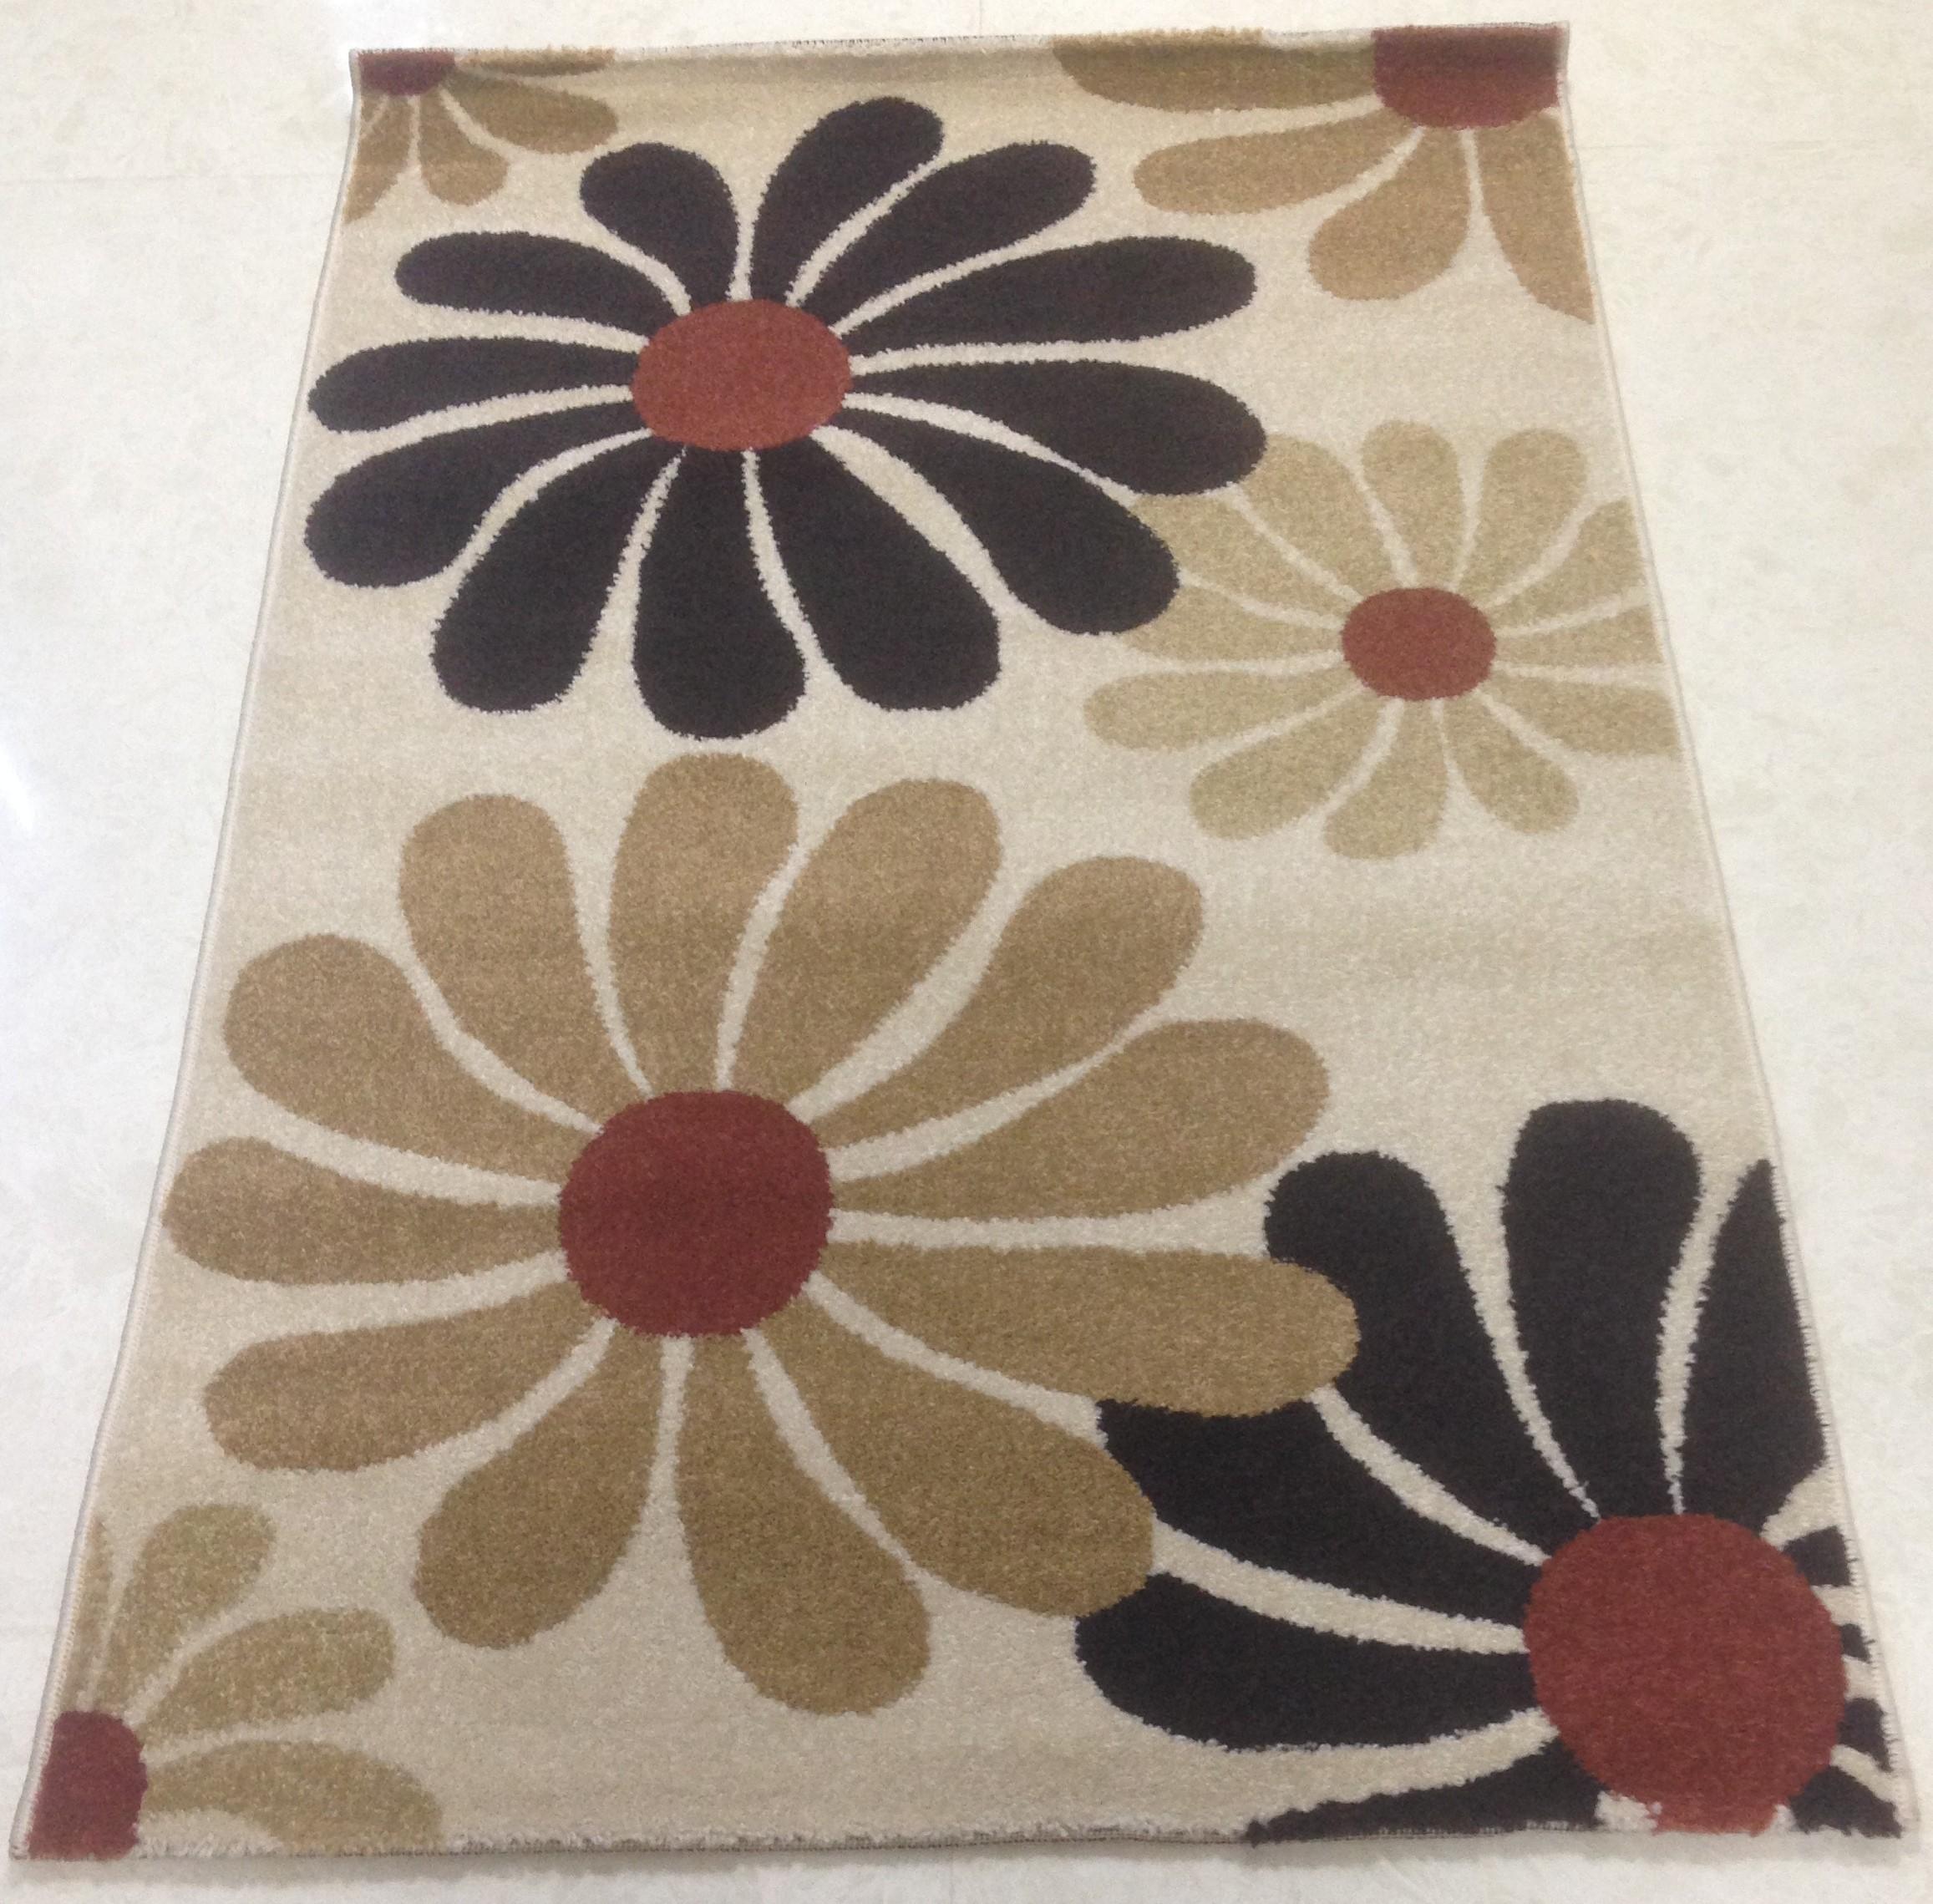 home goods carpet rug polypropylene carpet buy home goods carpet rug